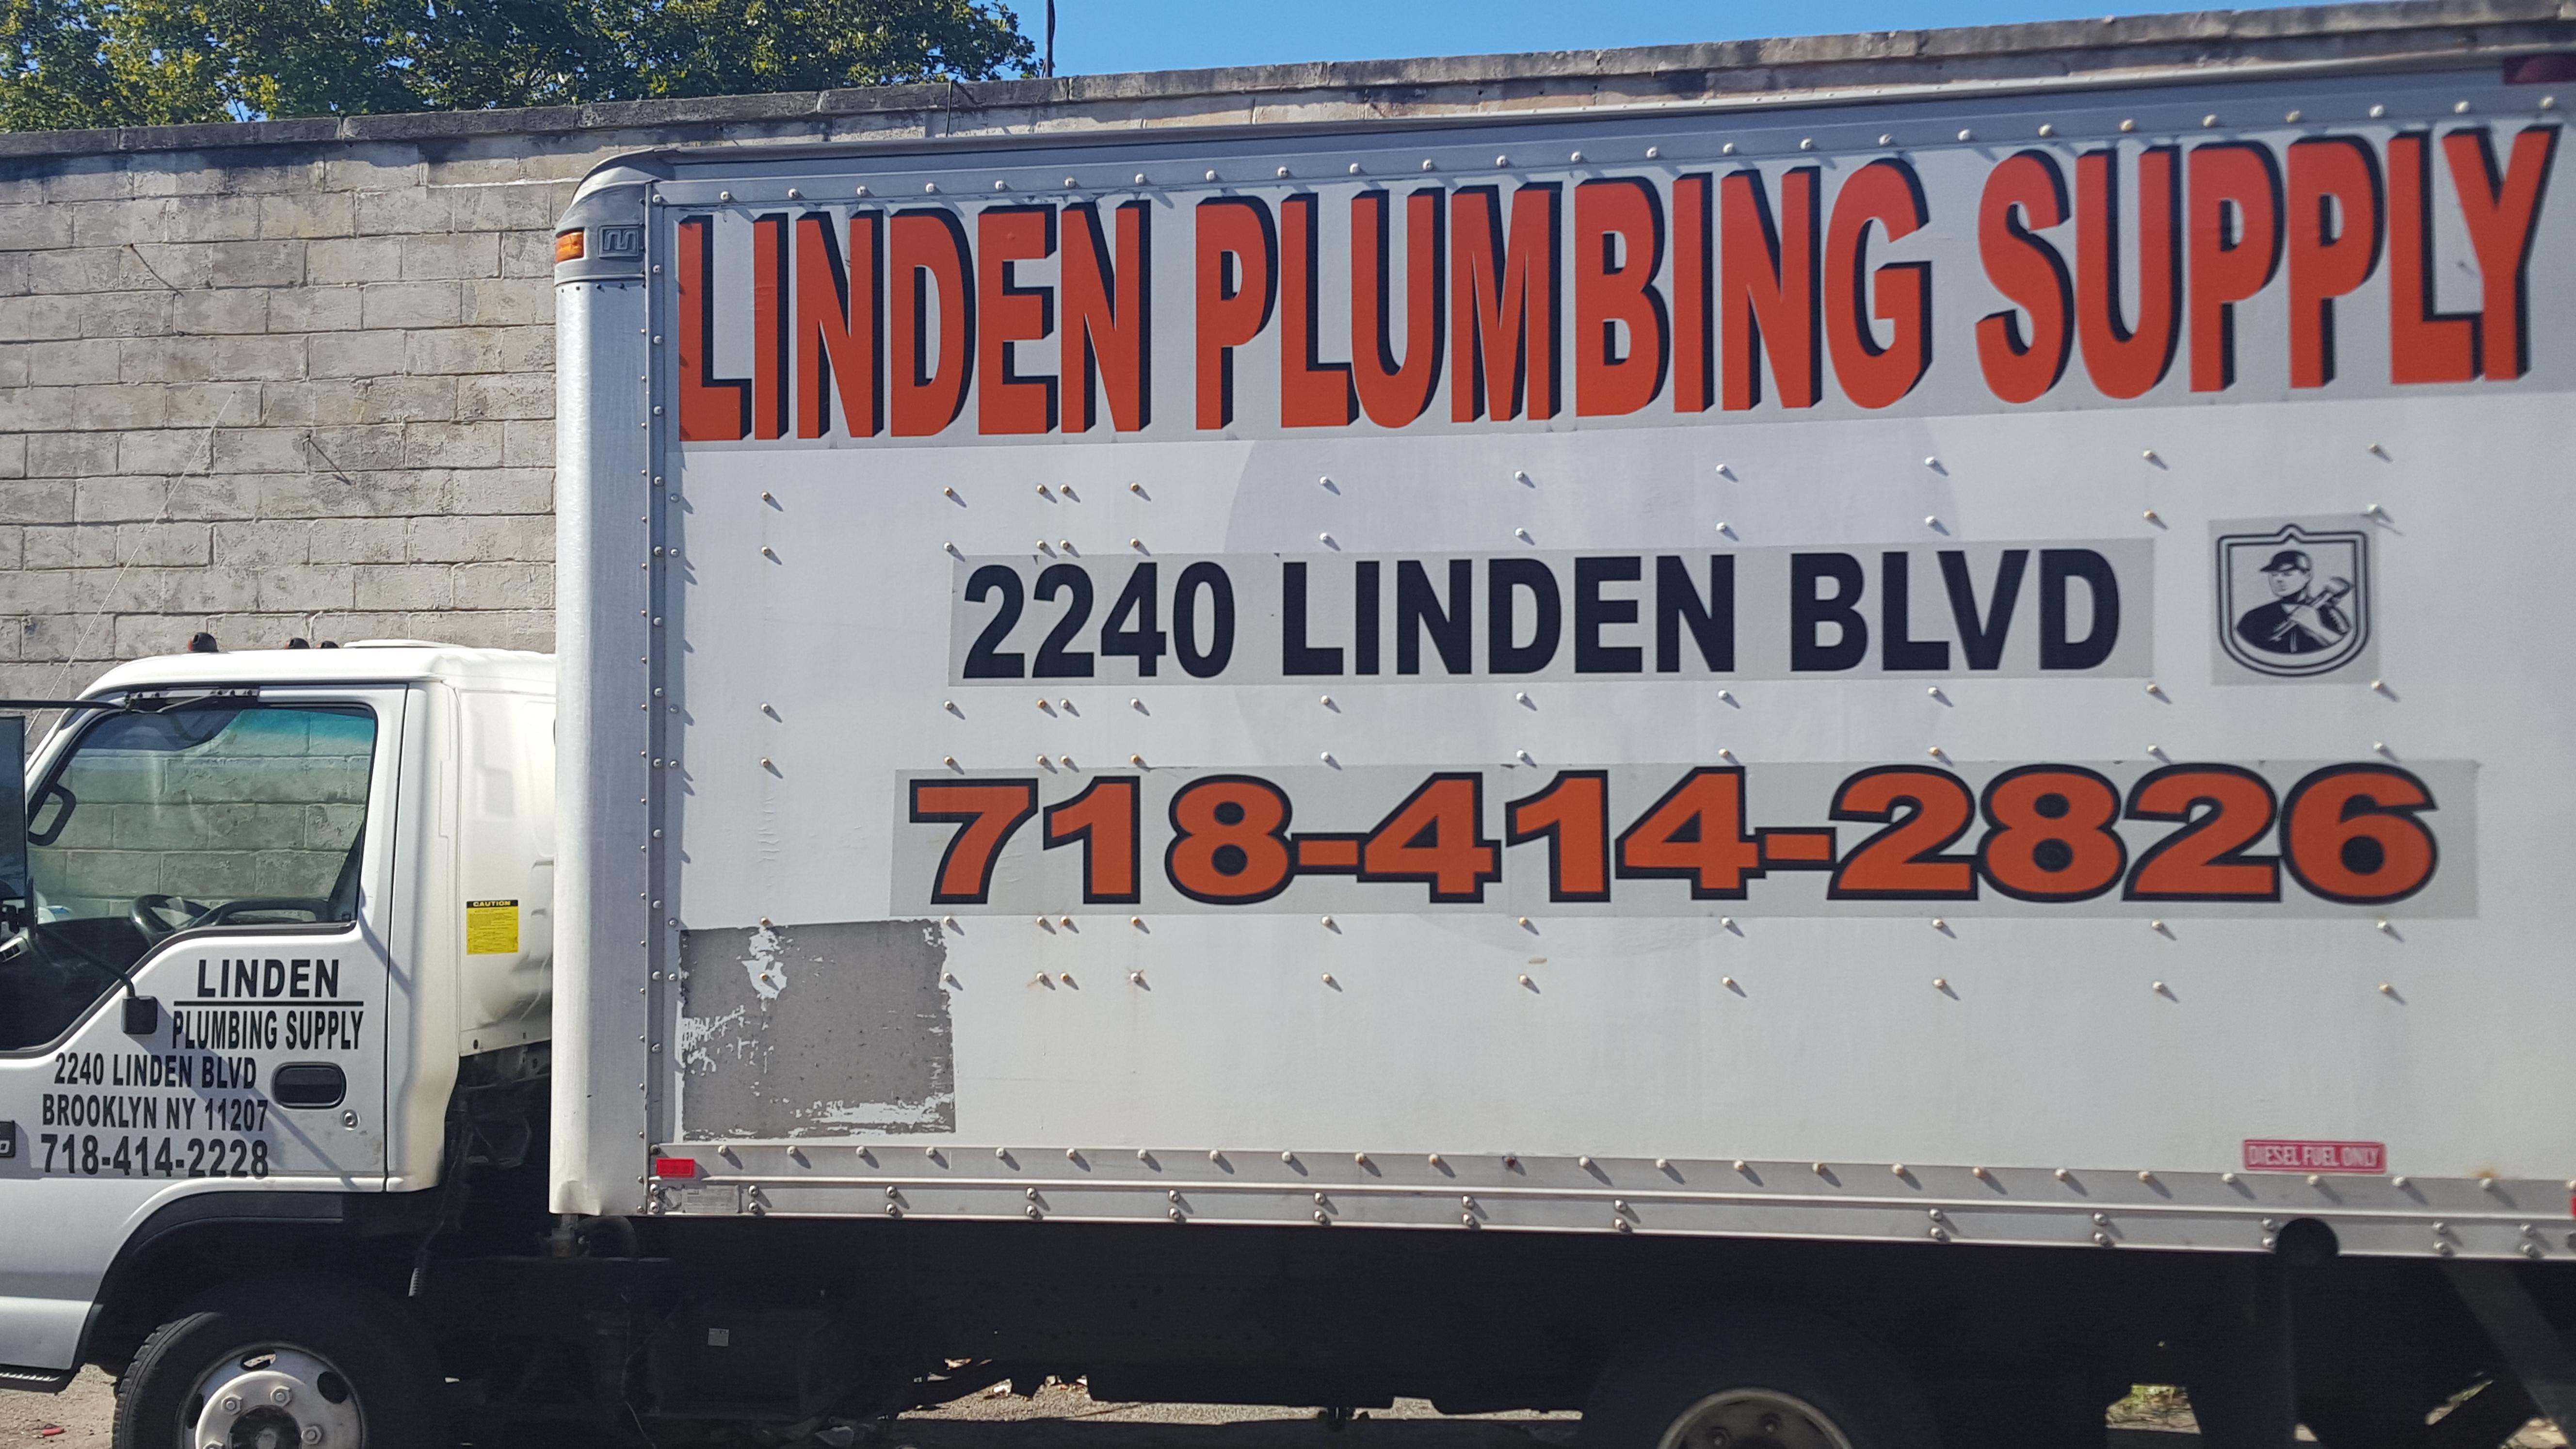 Linden Blvd Plumbing Supplies 2240 Linden Blvd Brooklyn Ny 11207